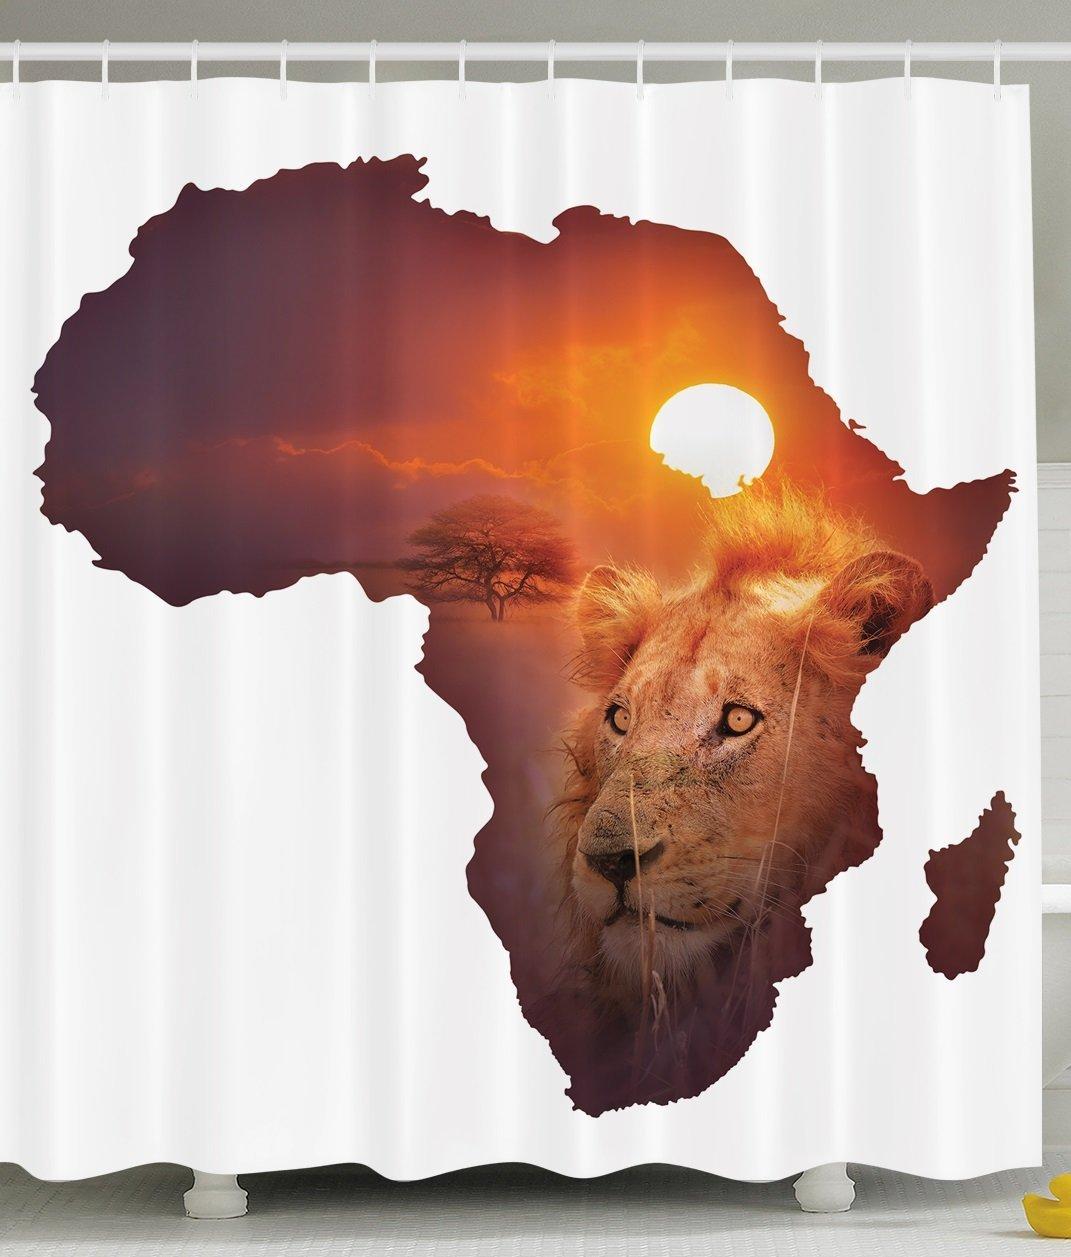 Safari Decor African Art Wildlife Shower Curtain Continent Lion Sunset Digital Print High